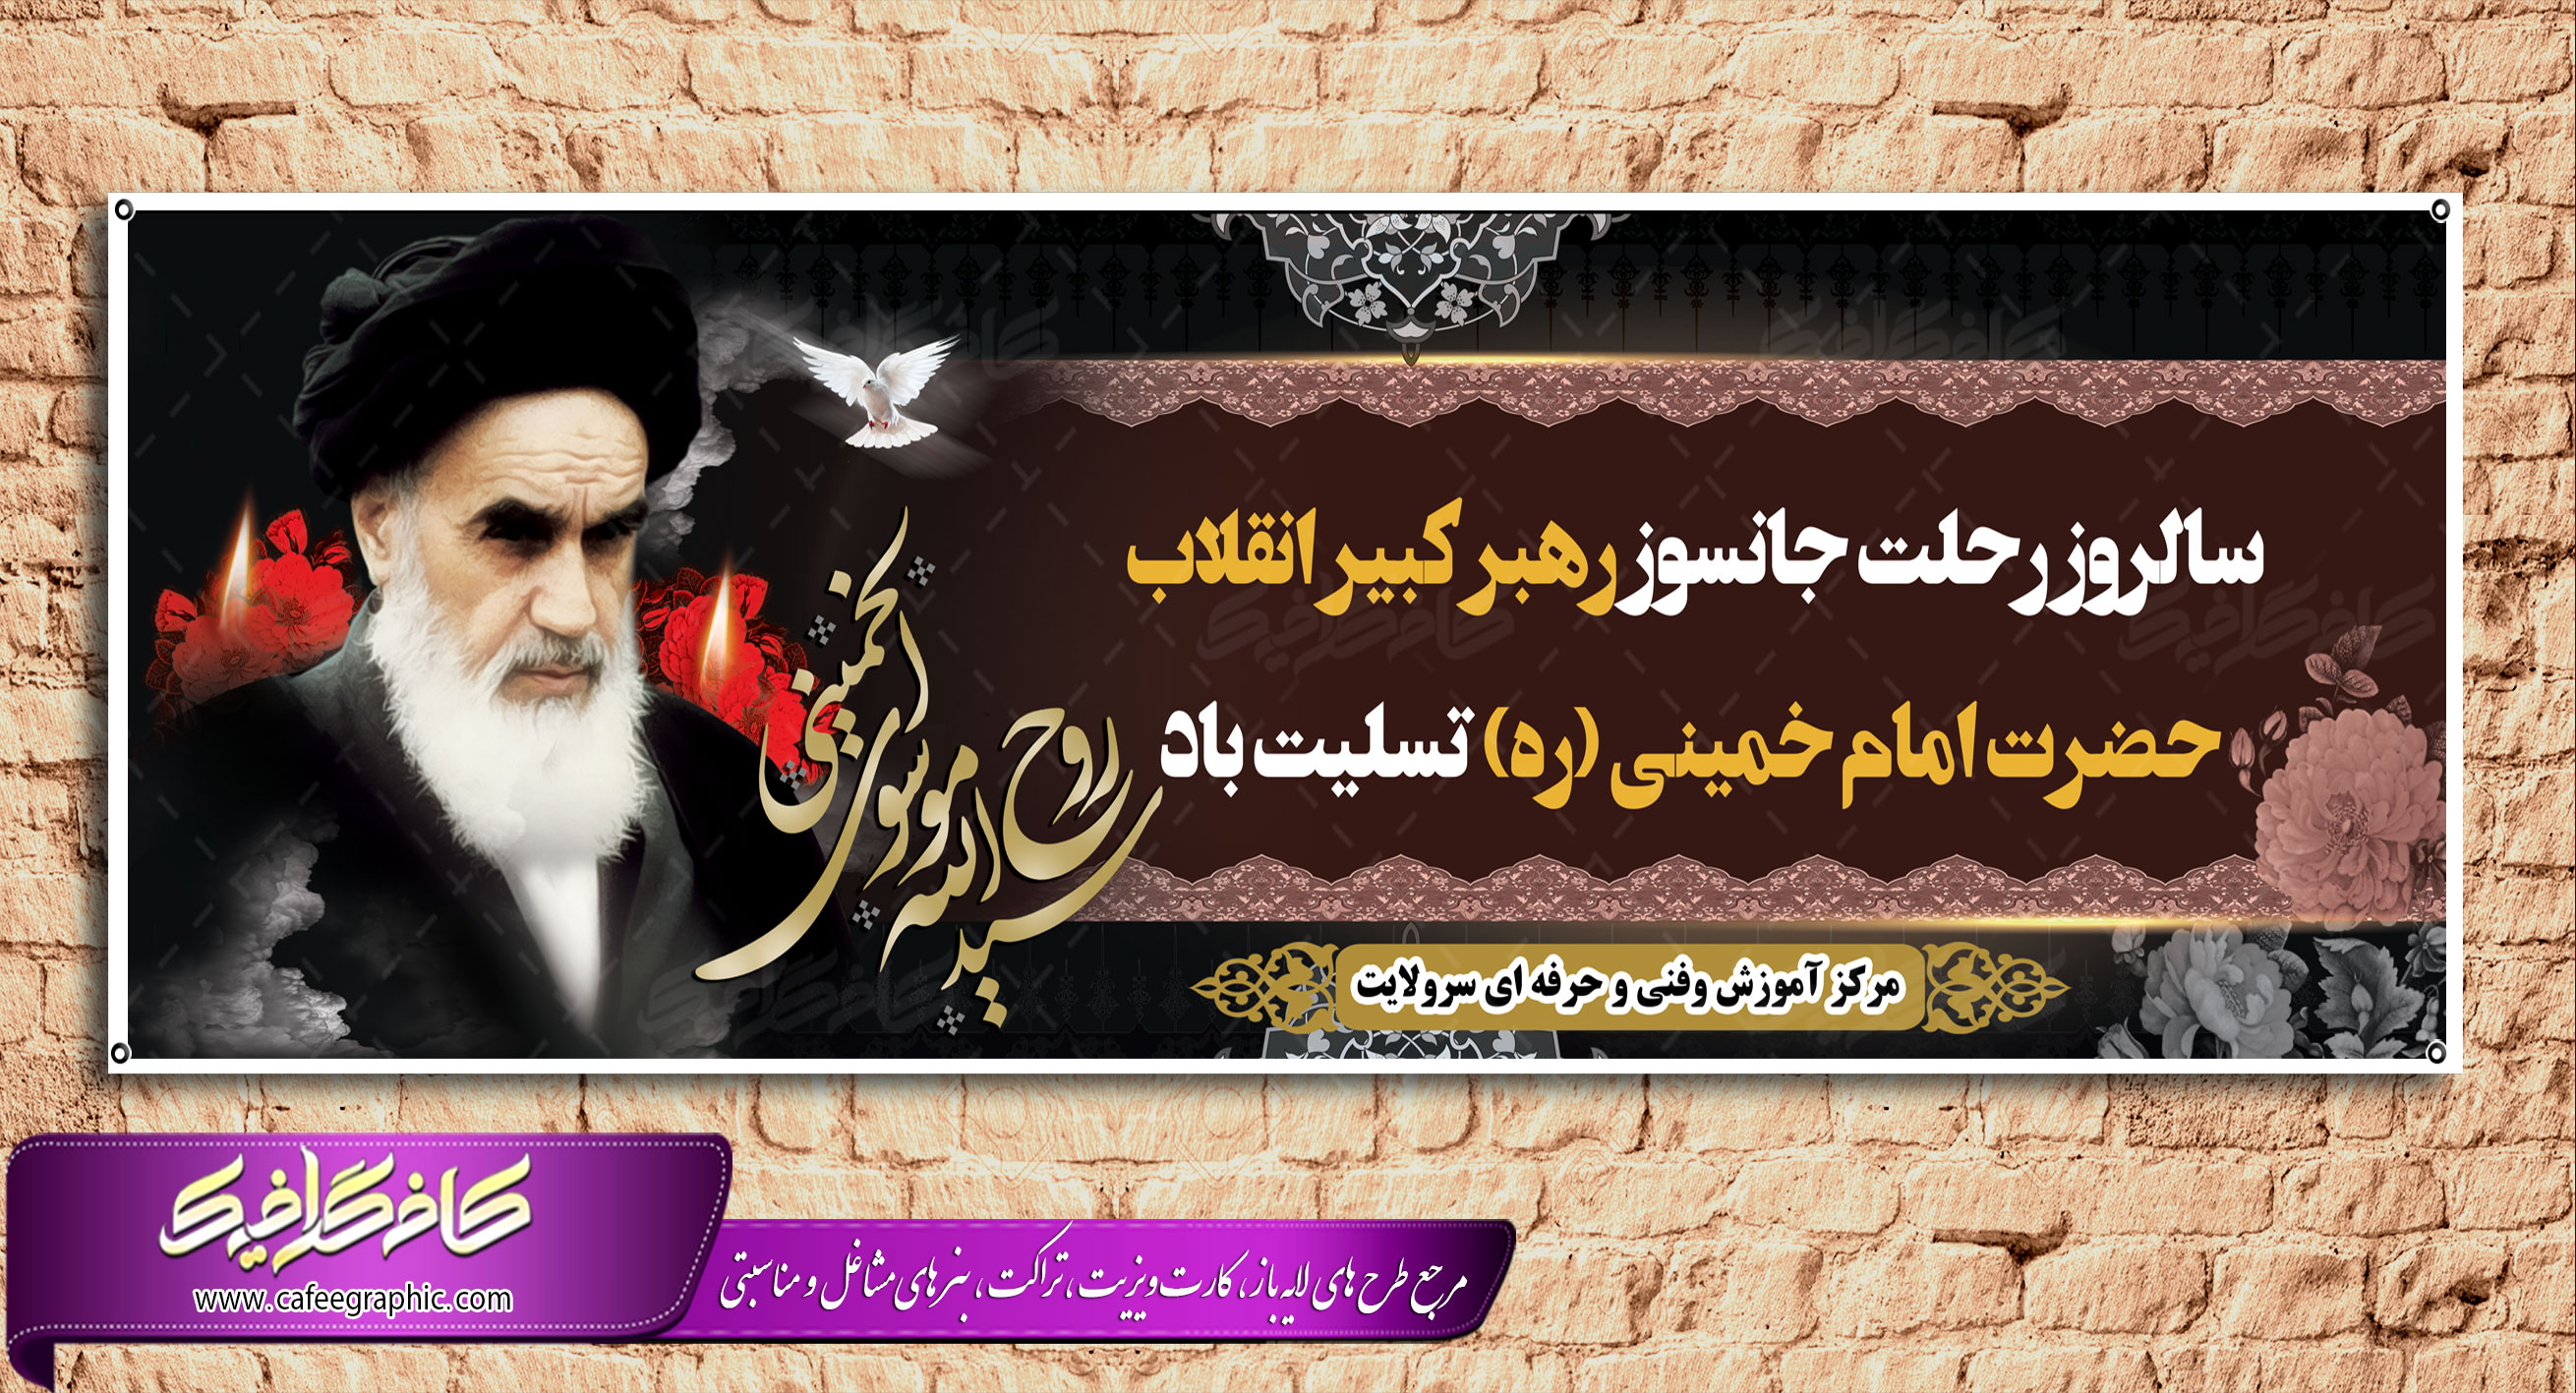 بنر سالگرد رحلت امام خمینی (ره)